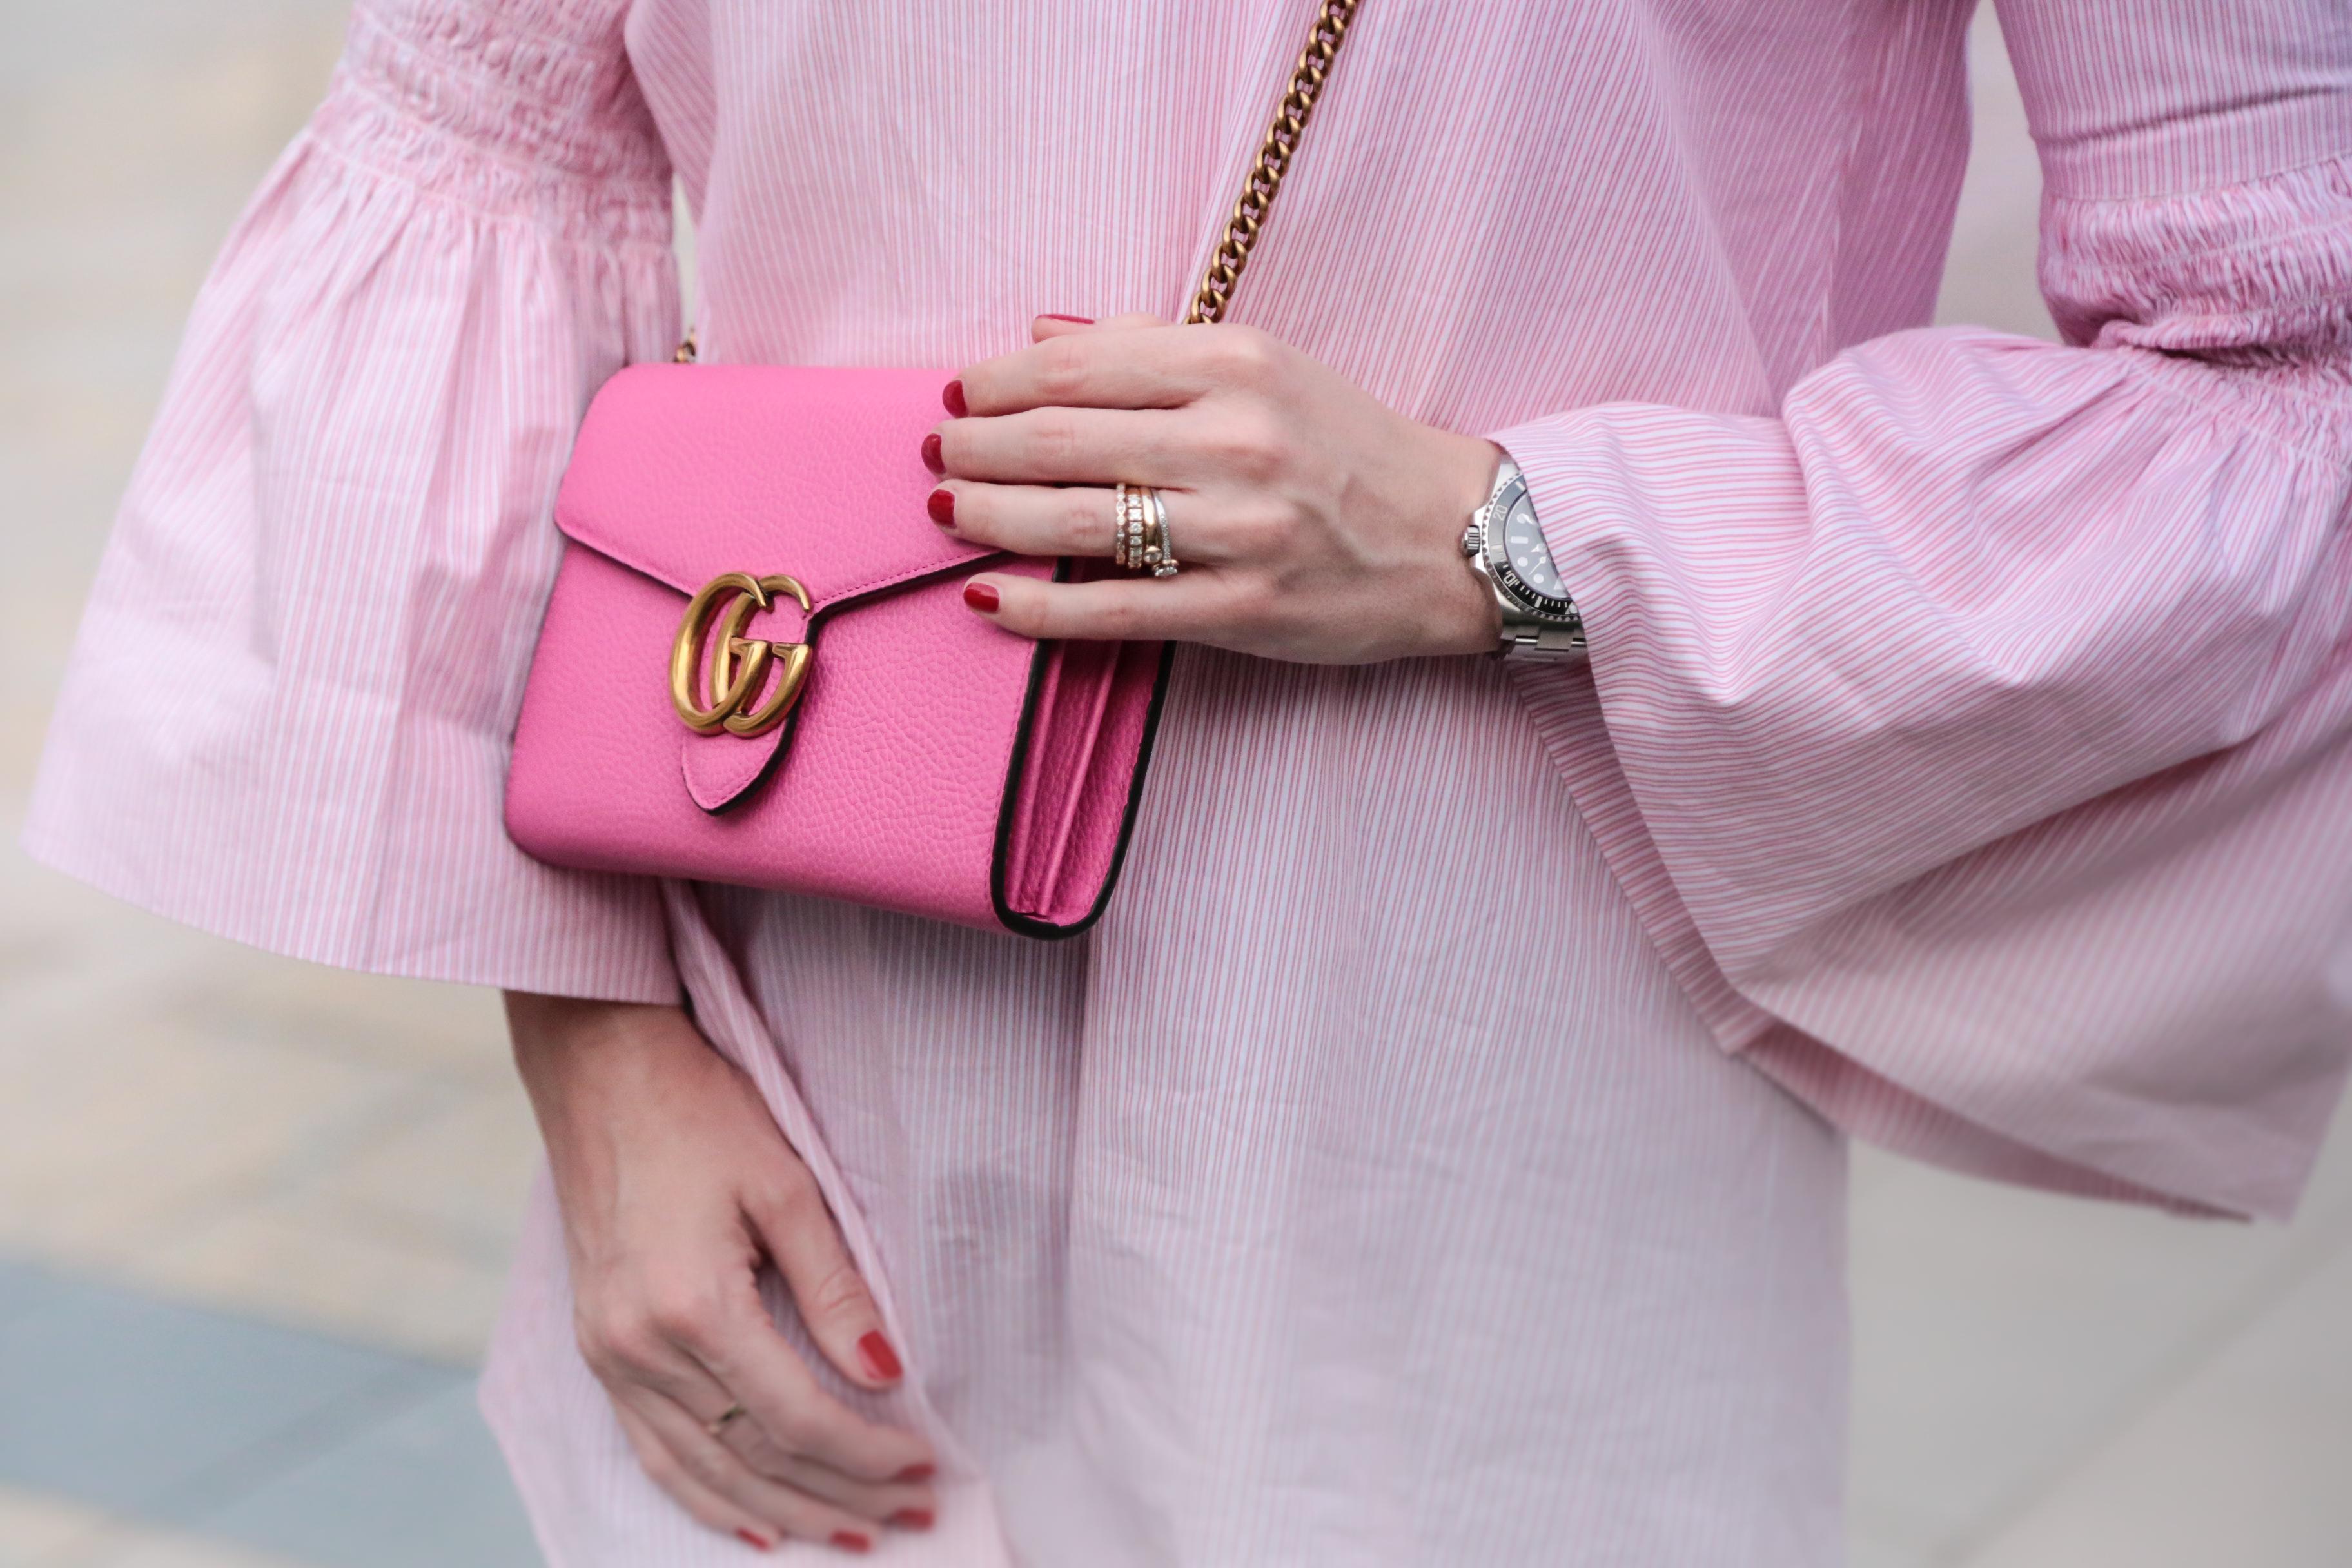 Monatsrückblick #1 Januar 2017 Lifestyle Jenni Diary Tagebuch Dubai Shopping Gedanken Urlaub Paris Reisen Fashion Rosa Cars